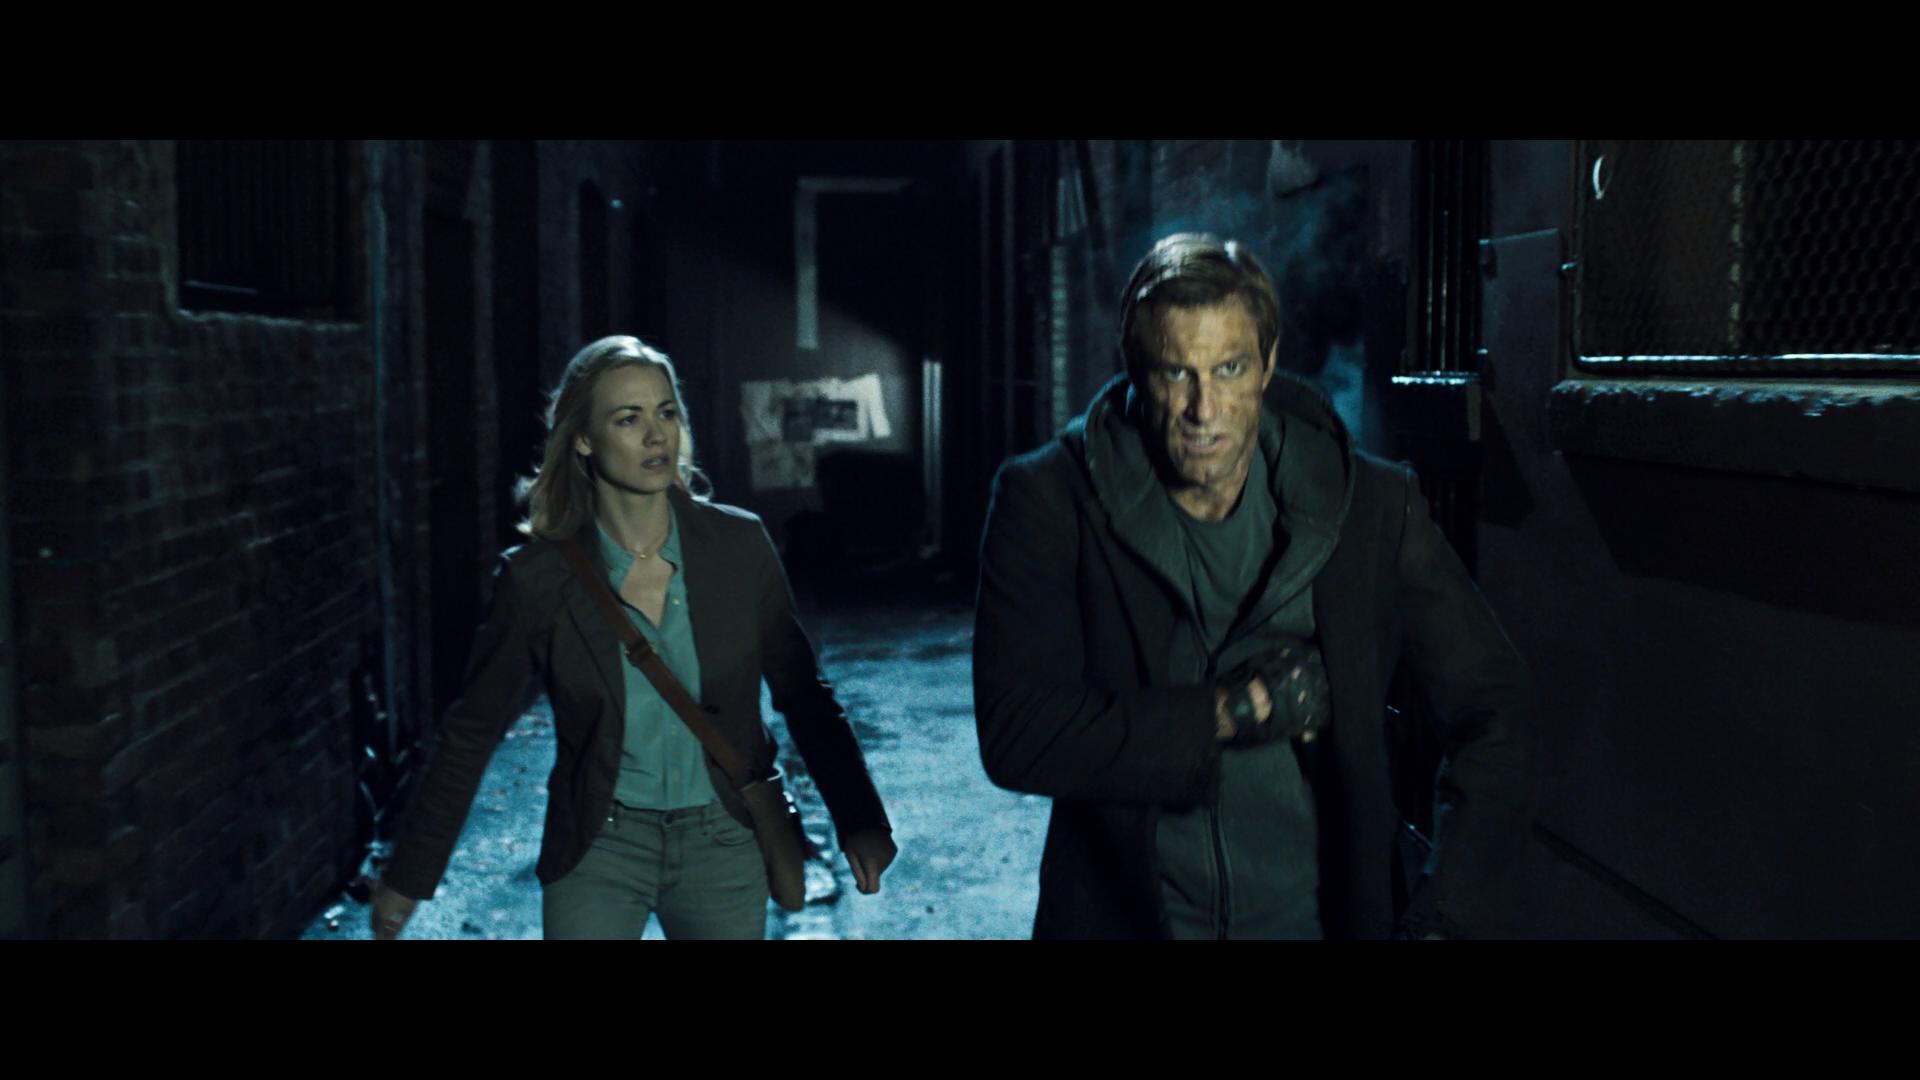 Я, Франкенштейн / I, Frankenstein (2014) BD-Remux 1080p | 2D, 3D | US Transfer | Лицензия